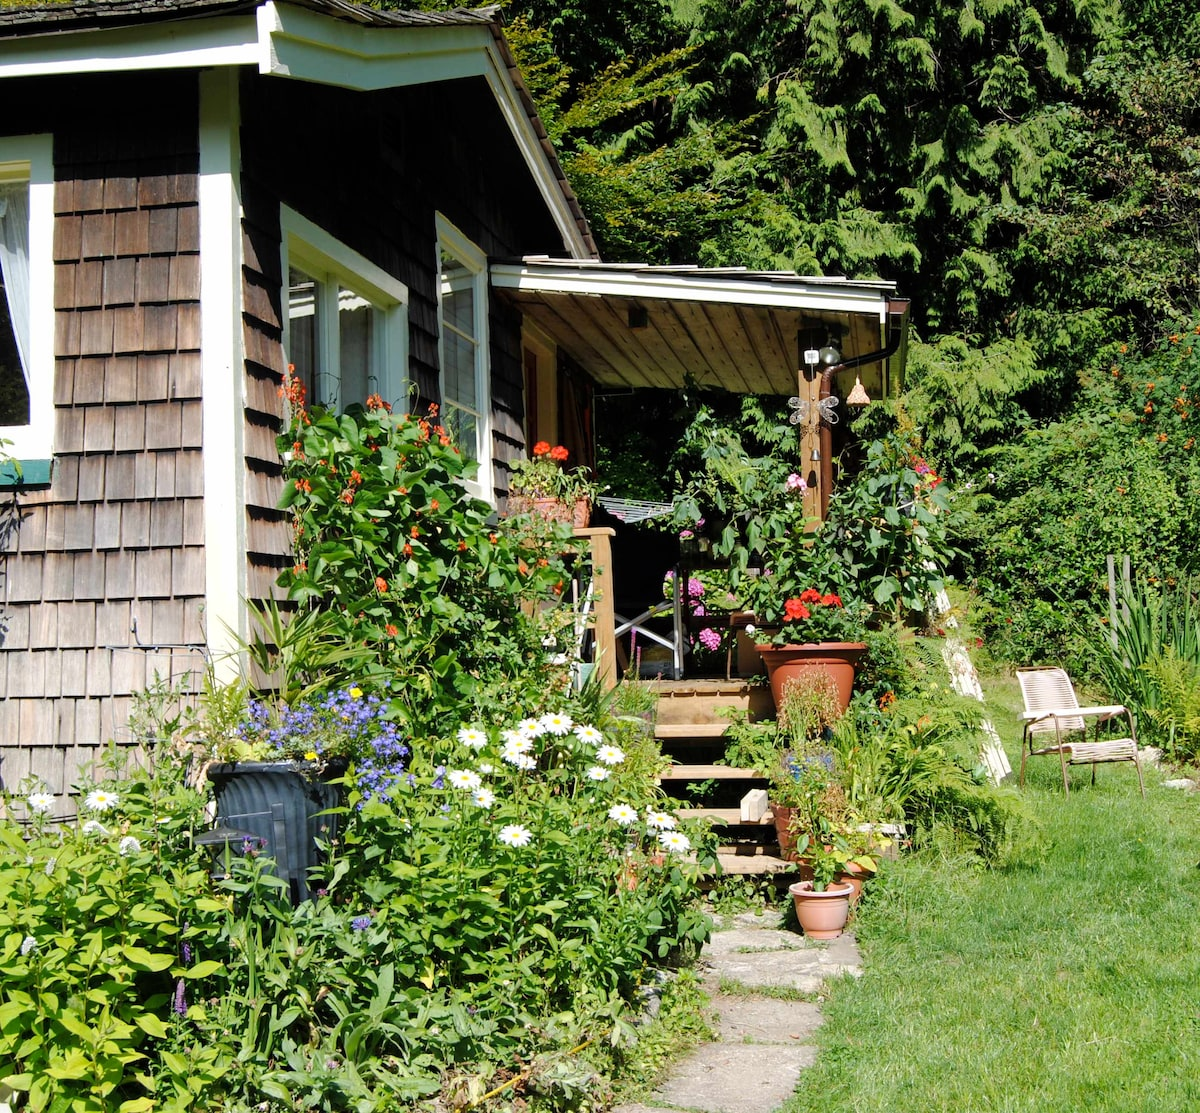 Joe Creek cottage in late summer